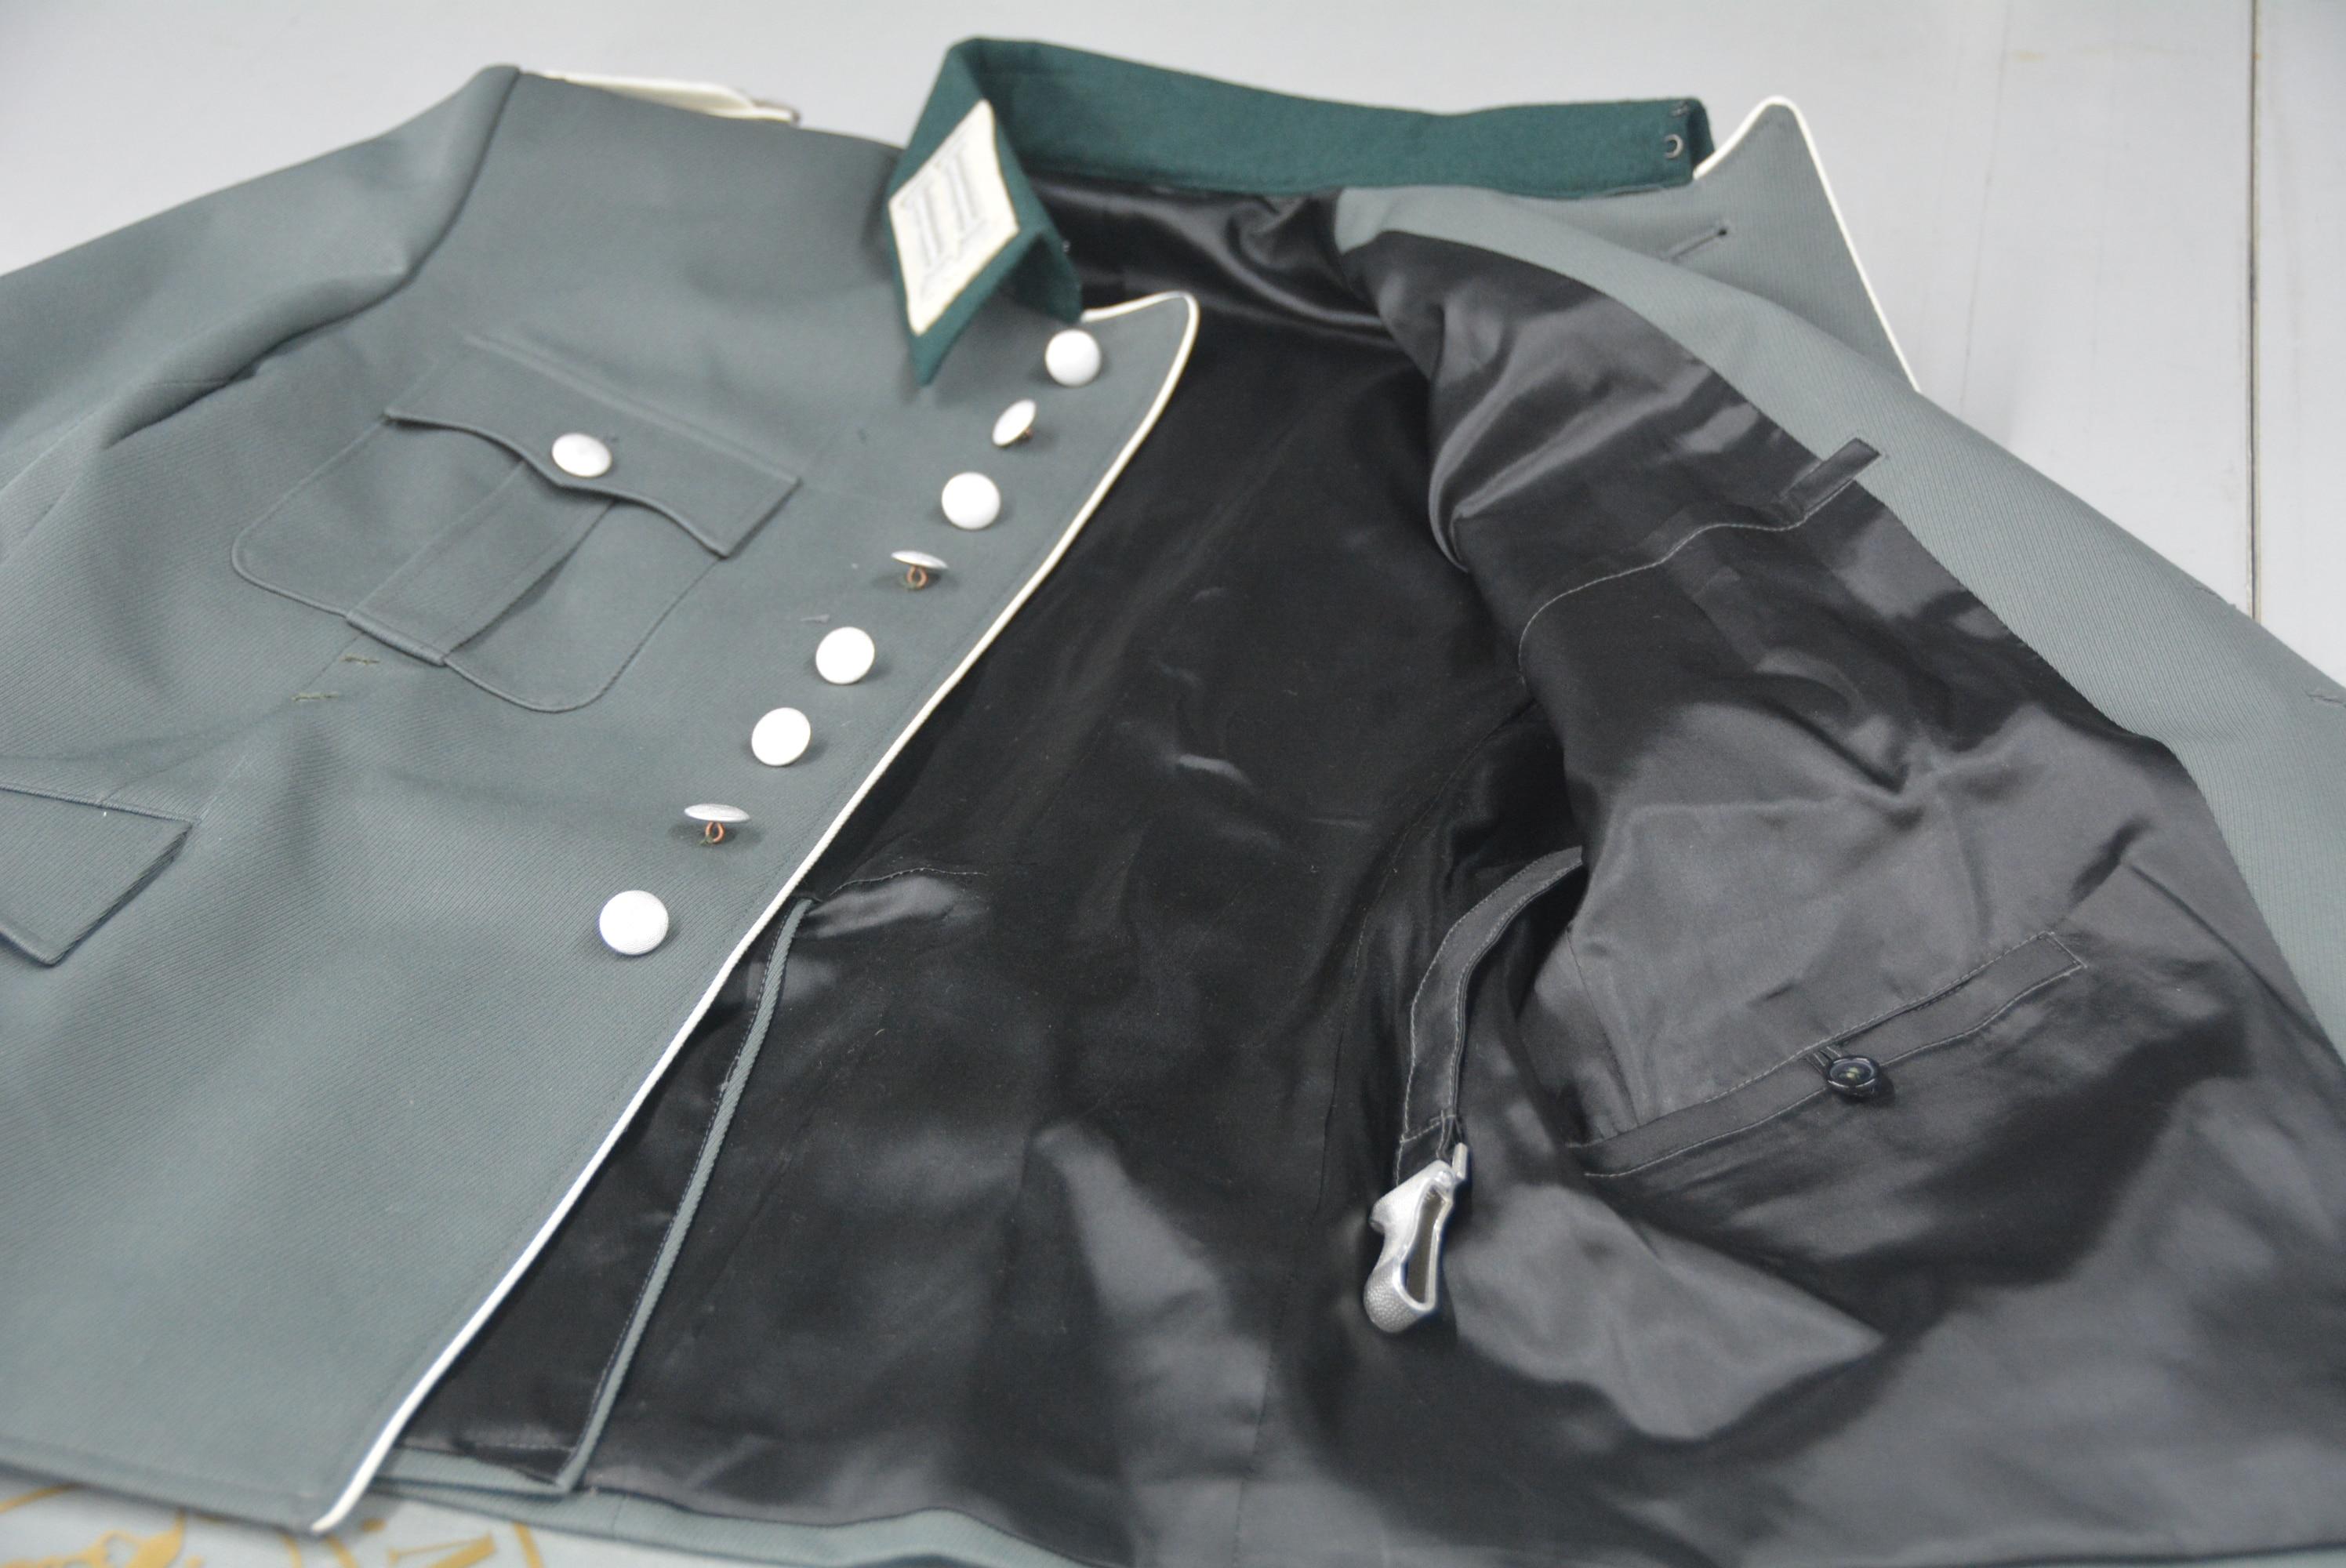 EMD/Lnfantry vestido/oficial/sarga lana/chaqueta